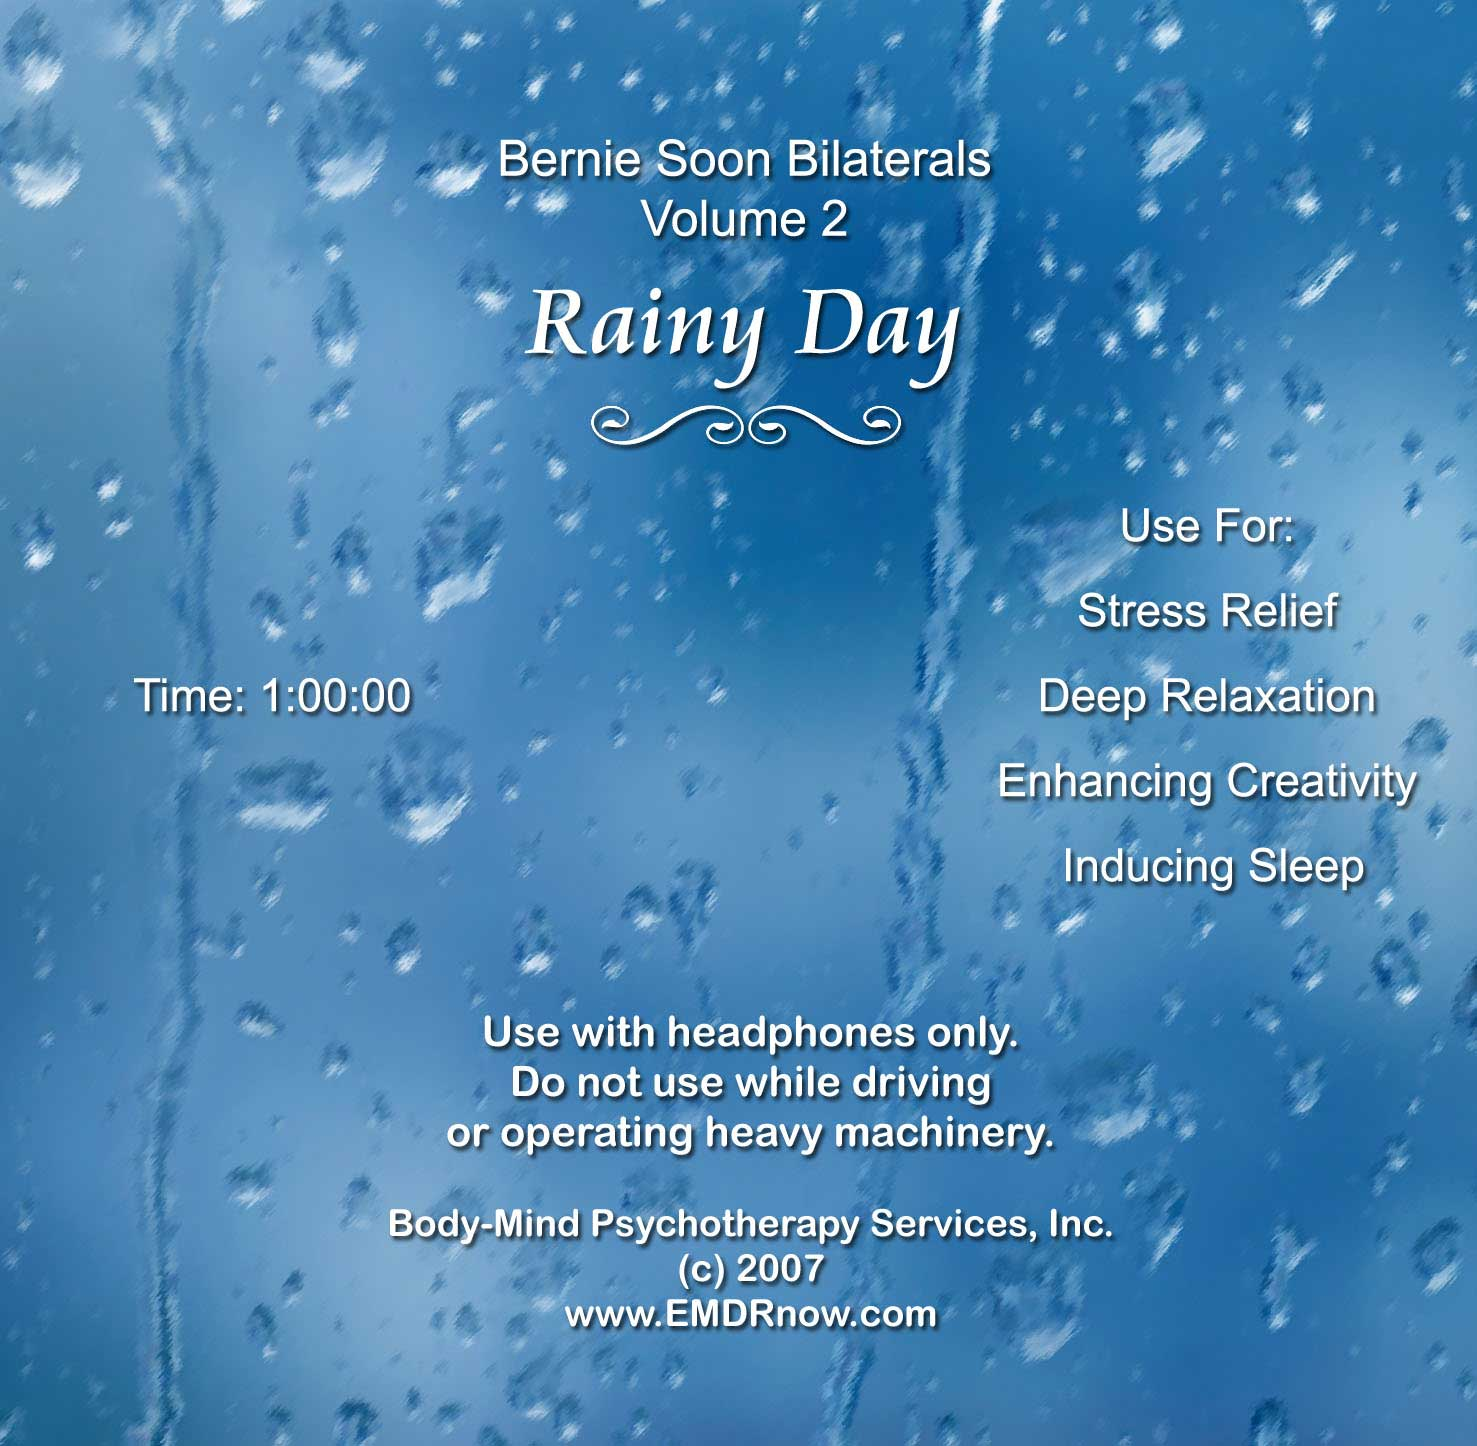 EMDR Bilateral CD Vol. 2 Rainy Day